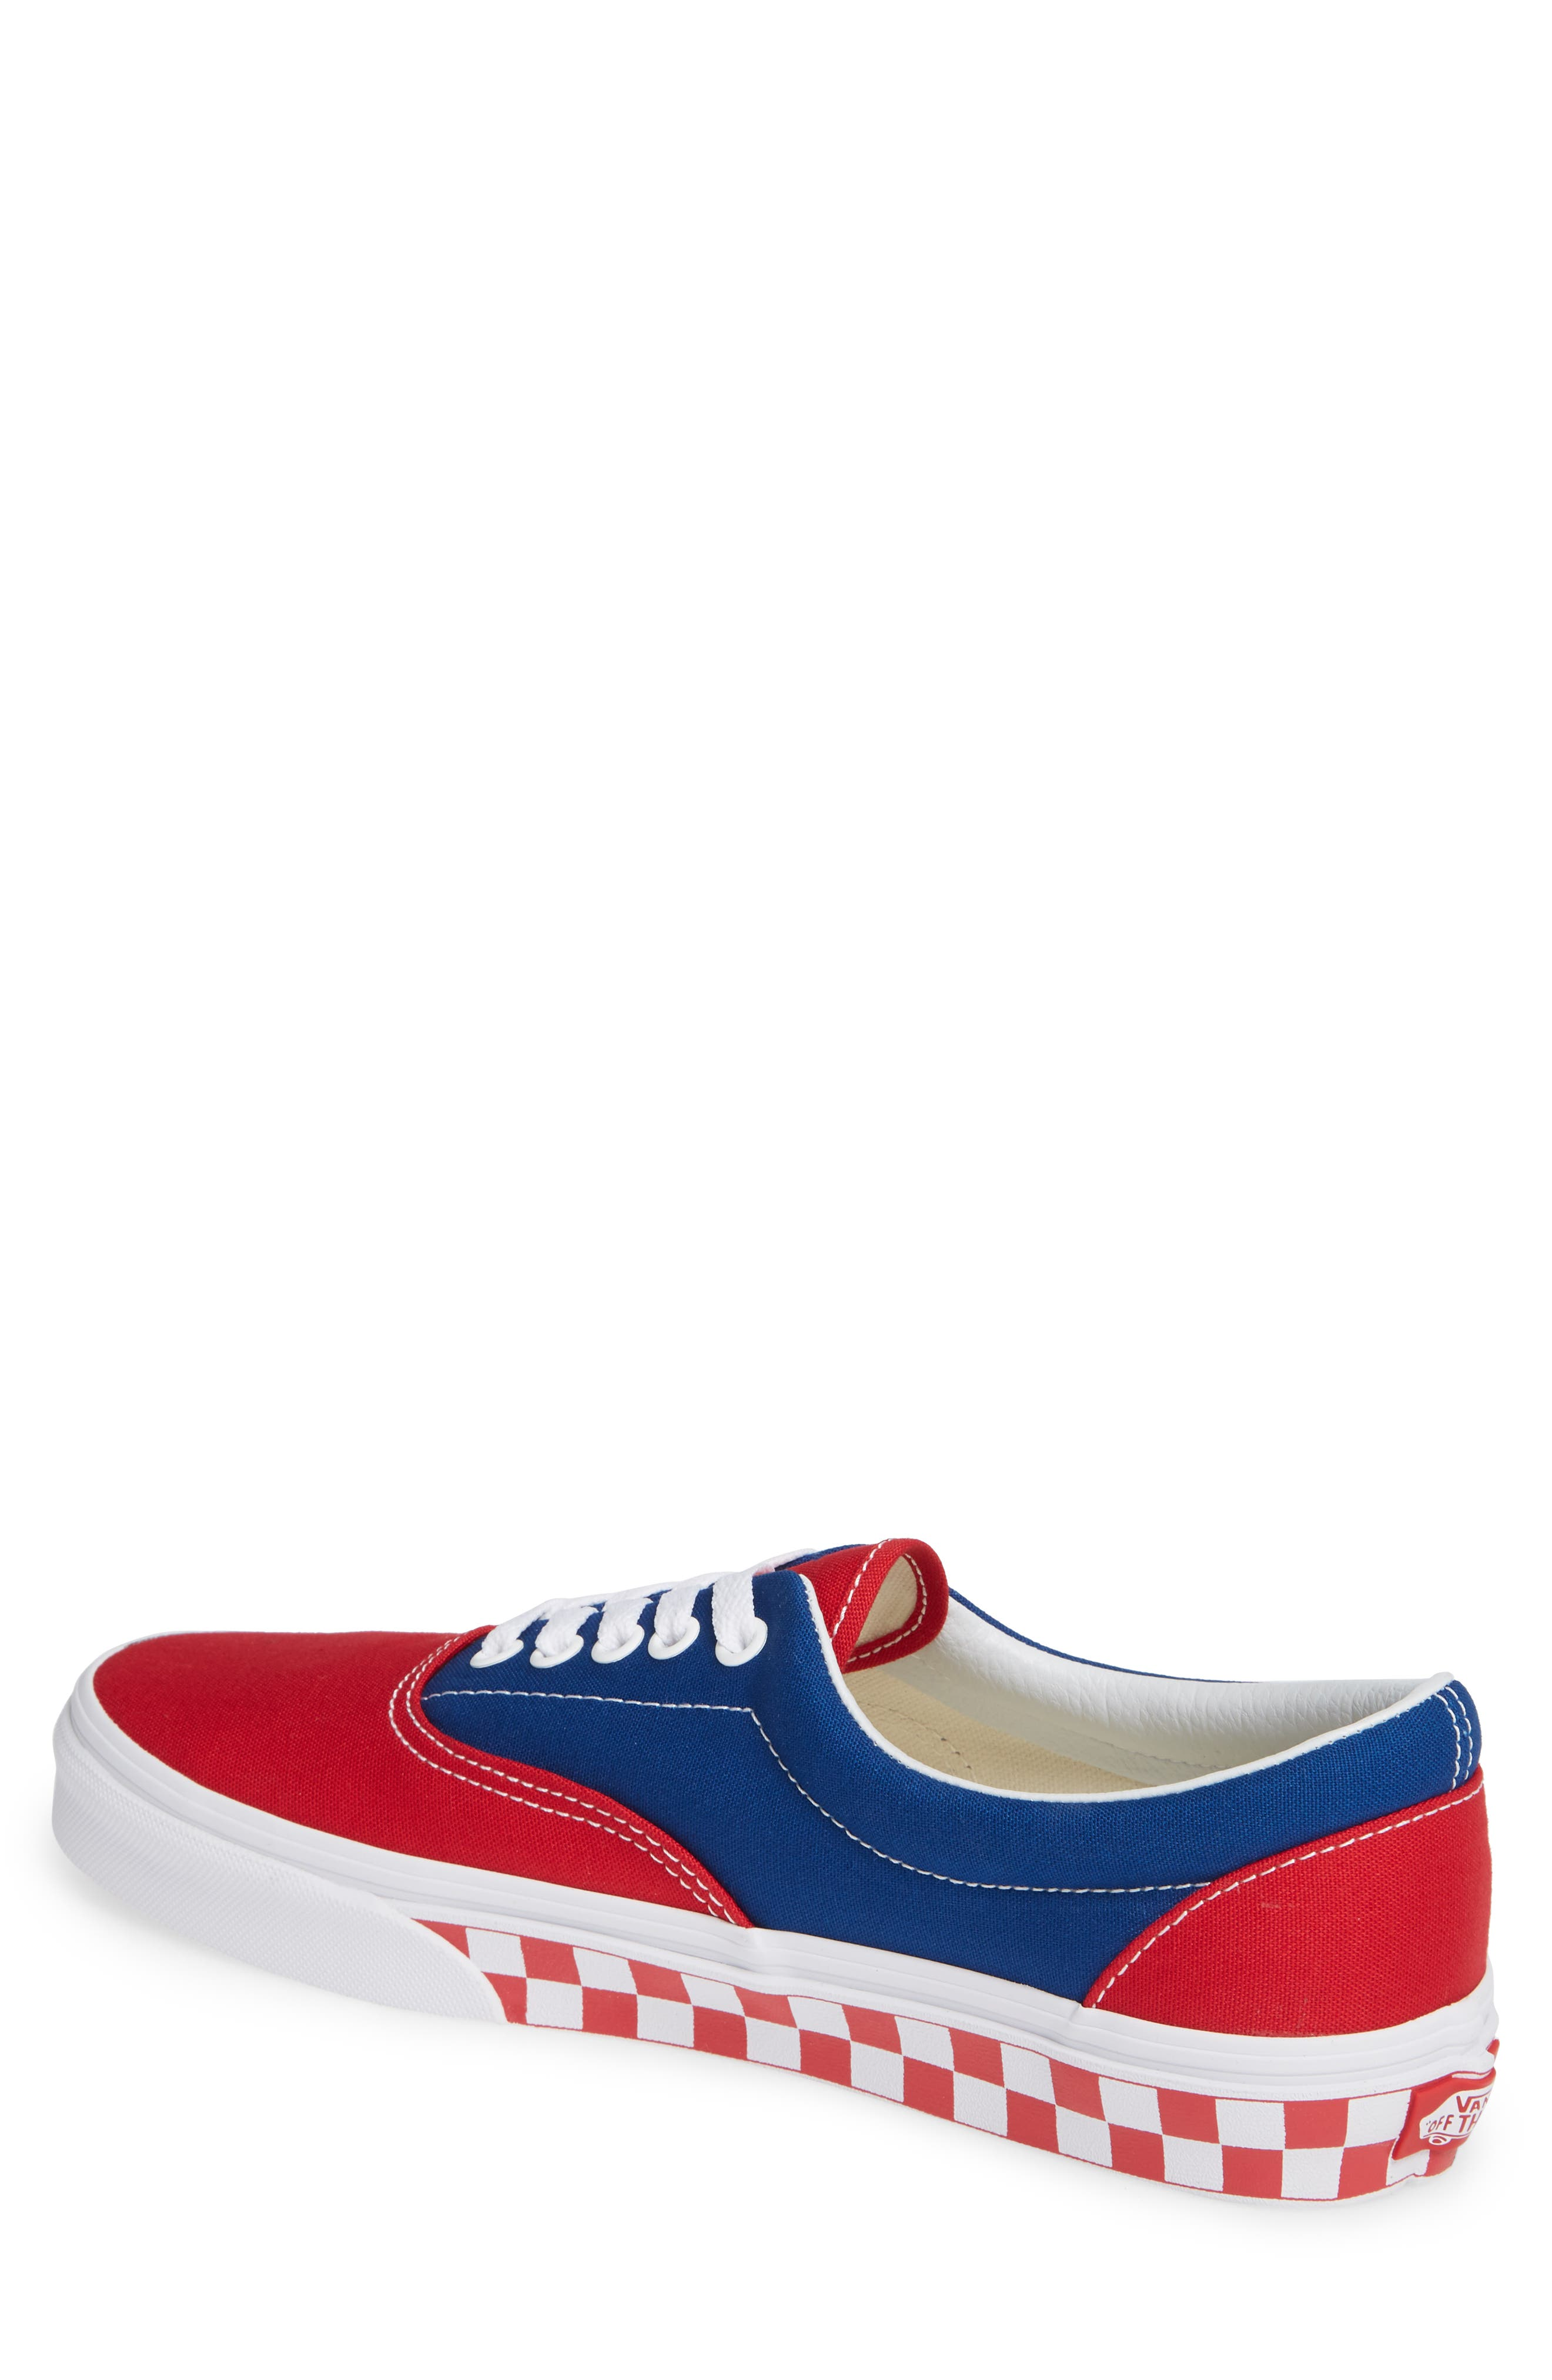 BMX Checkerboard Era Sneaker,                             Alternate thumbnail 2, color,                             BLUE/ RED CHECKER CANVAS